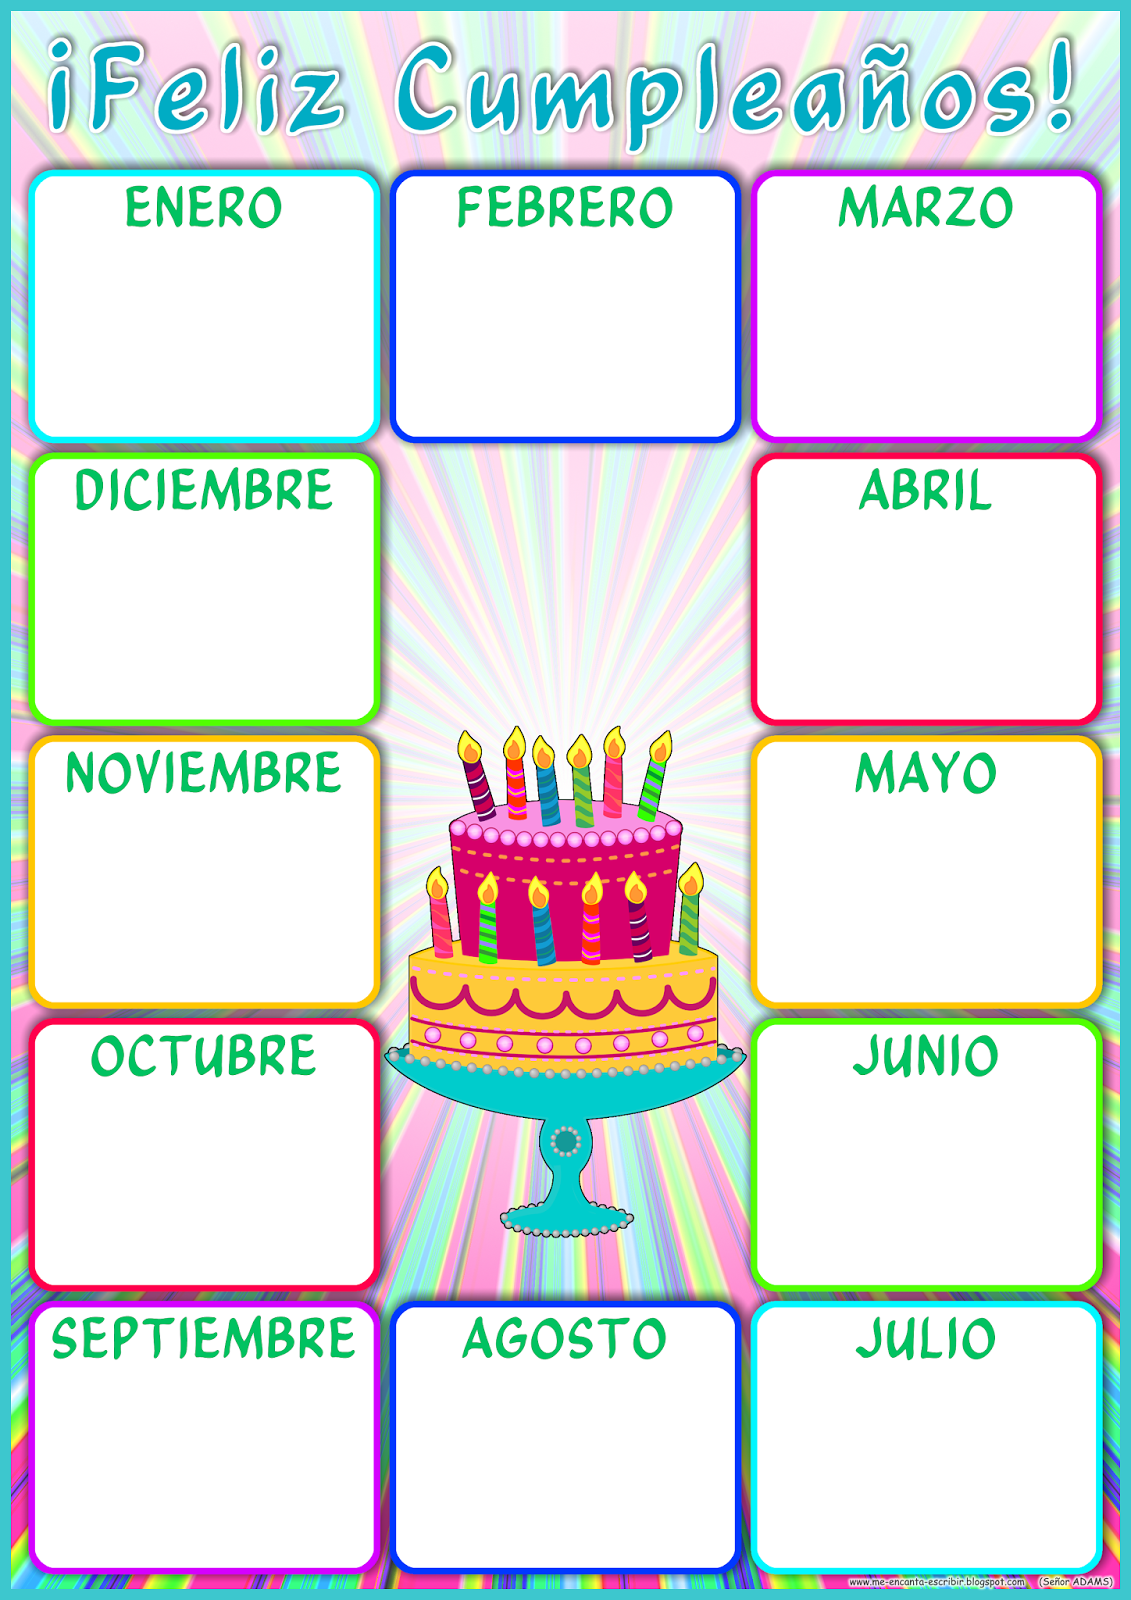 calendario de cumpleanos juve cenitdelacabrera co